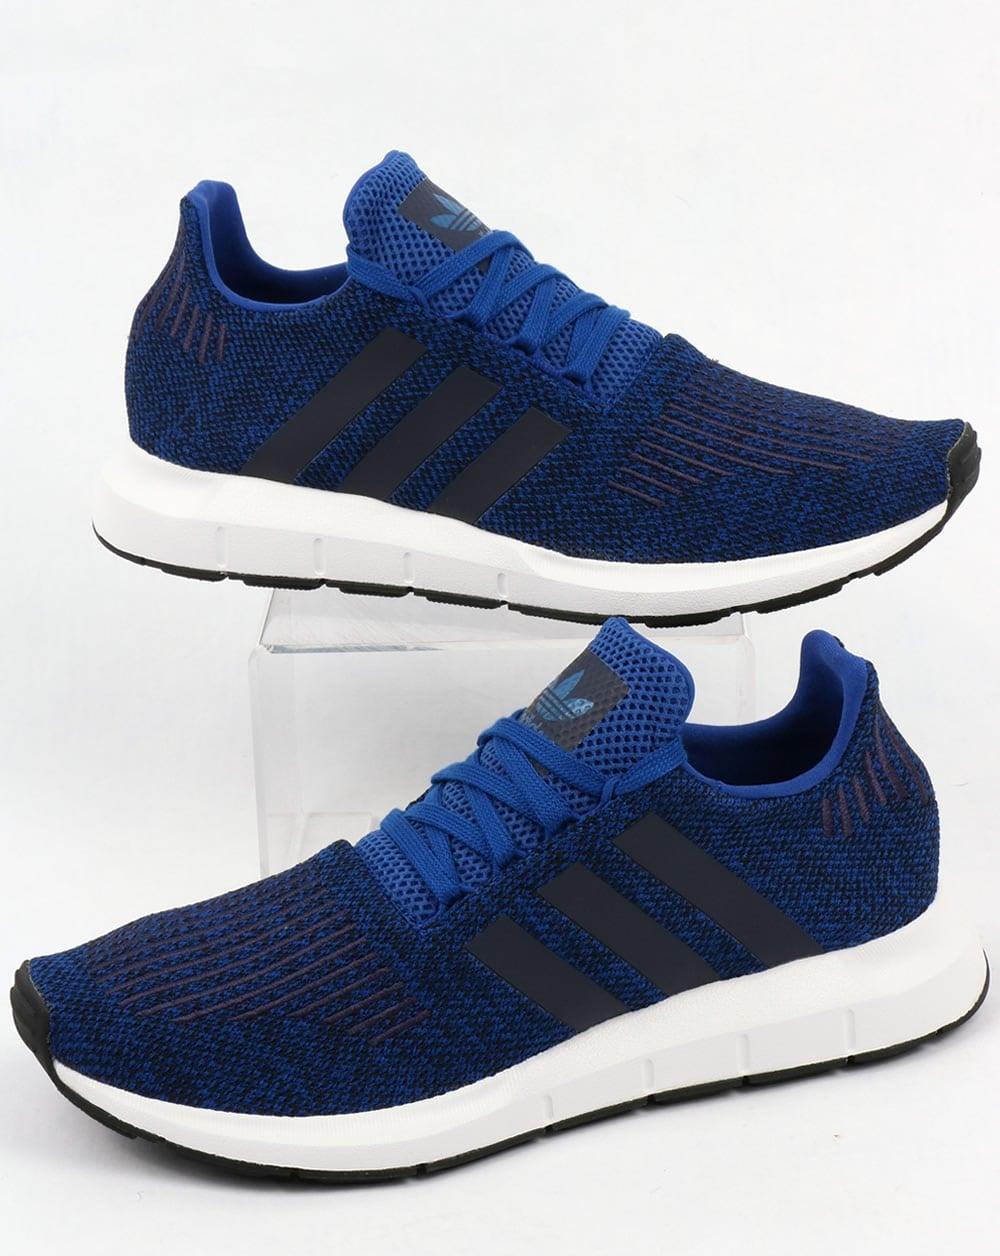 Adidas Swift Run Trainers Royal Blue